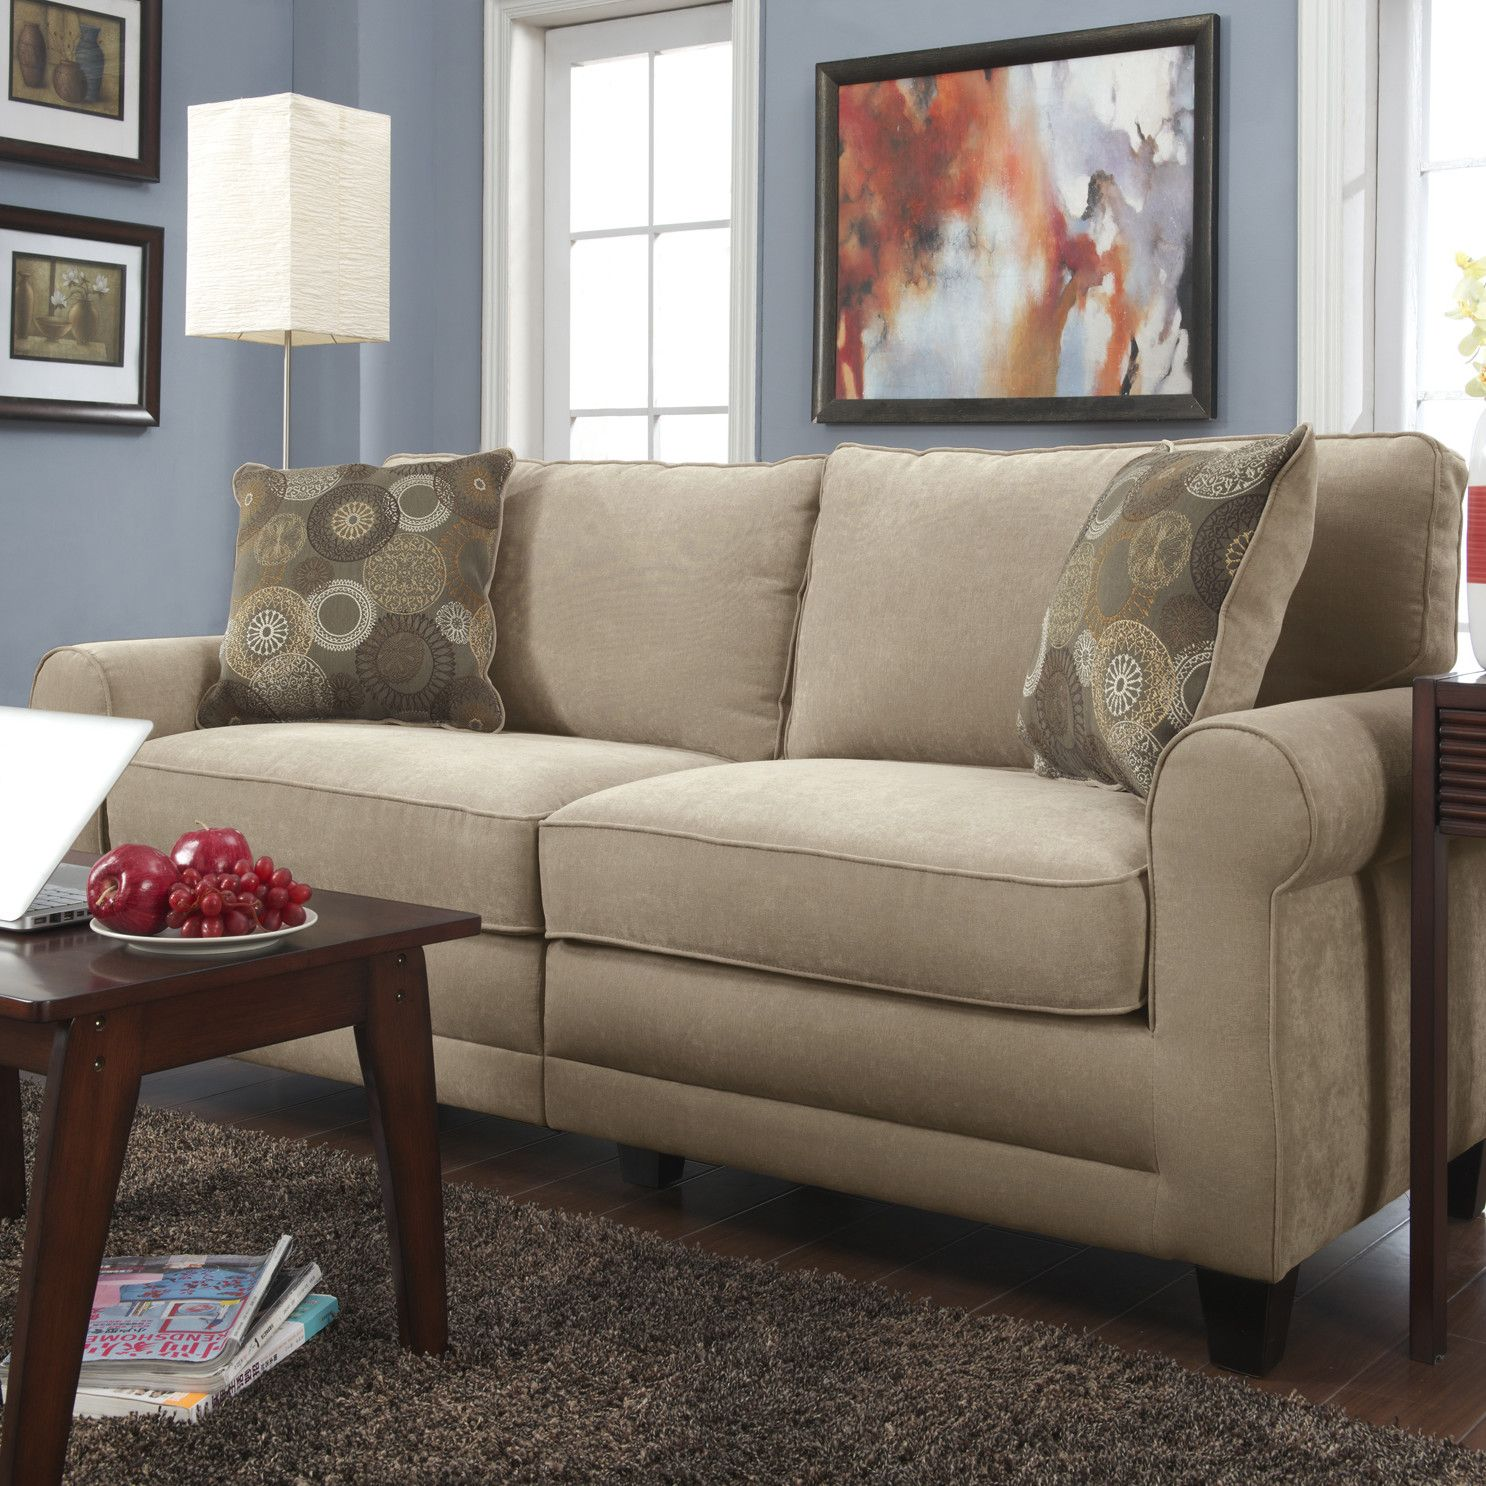 Incroyable Serta At Home Copenhagen Deluxe Sofa U0026 Reviews | Wayfair